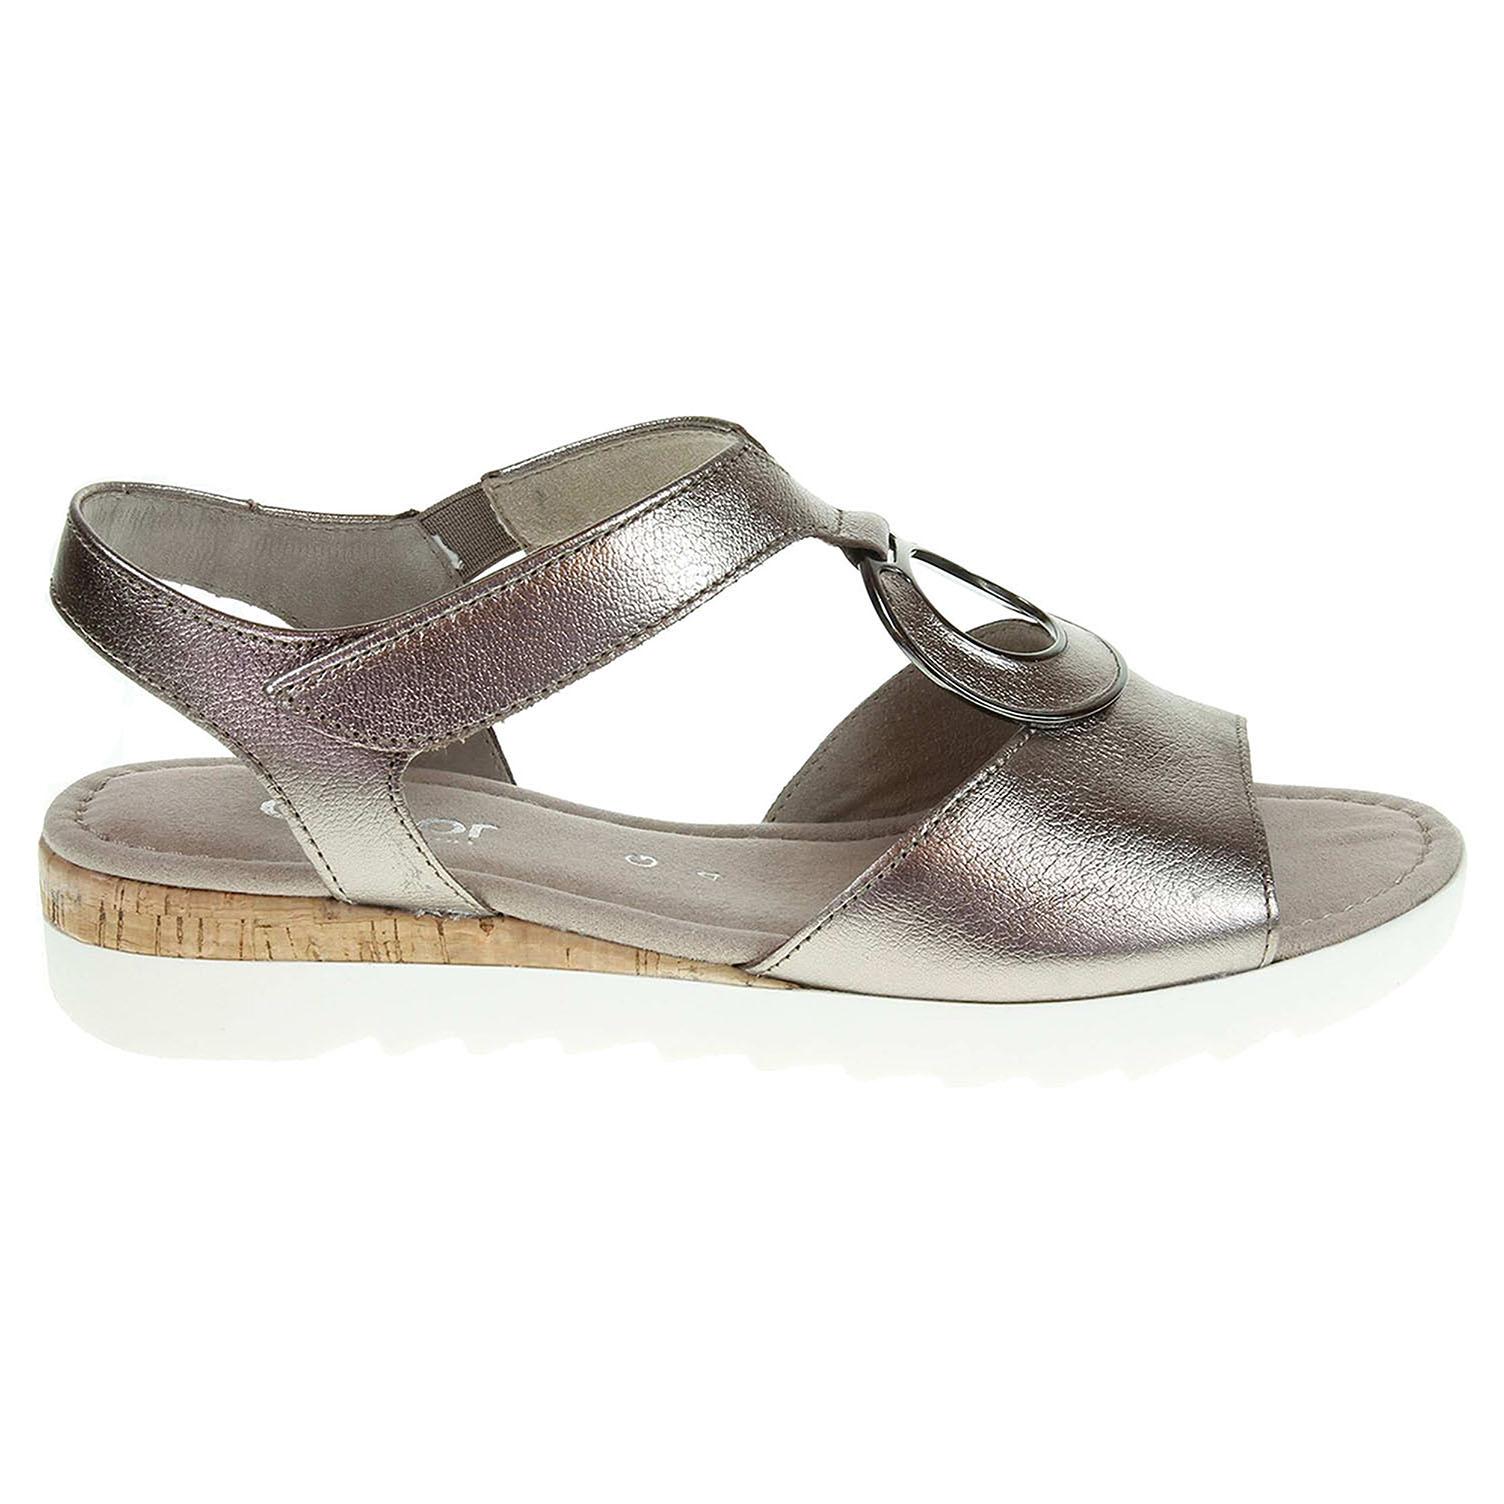 Ecco Gabor dámské sandály 62.745.65 bronzové 23801106